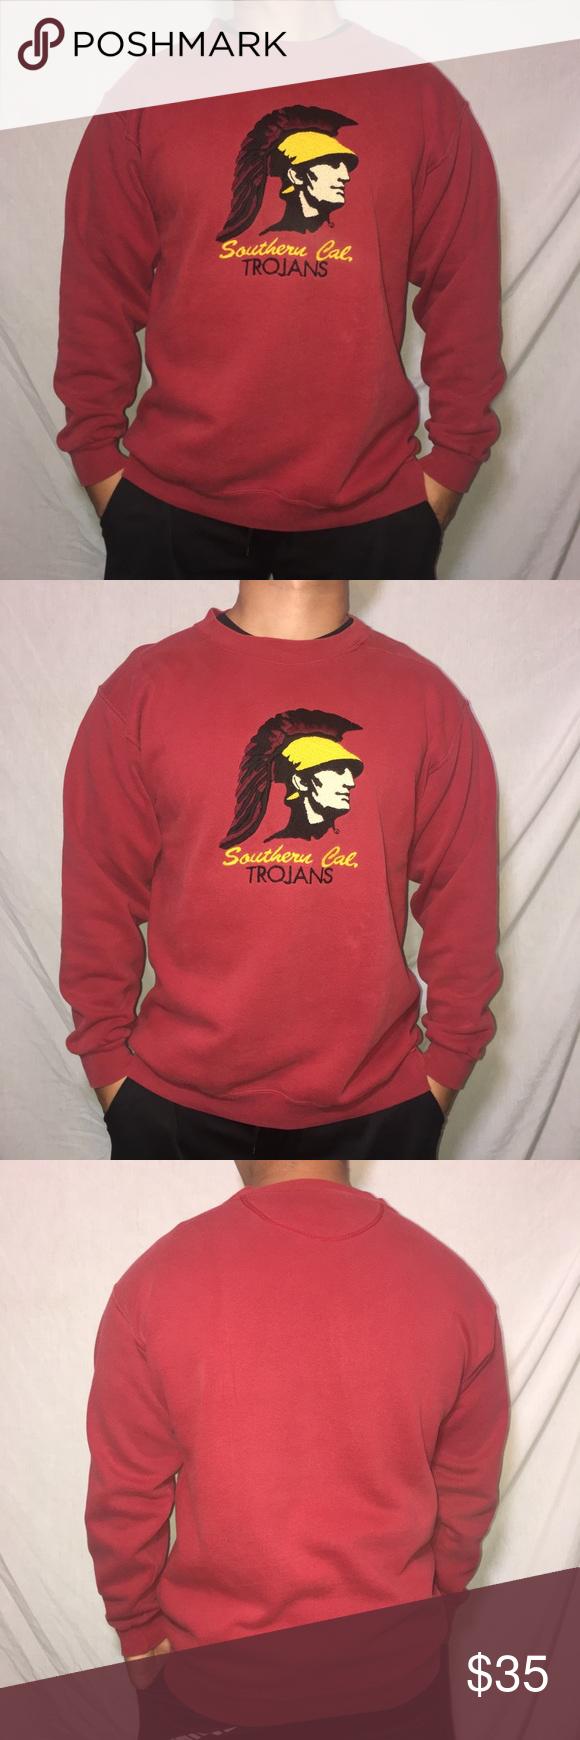 Vintage Usc Trojans Crew Neck Sweater Vintage Crew Neck Usc Trojans Sweater With A Huge Embroidered Logo In Great Crew Neck Sweater Sweaters Sweaters Crewneck [ 1740 x 580 Pixel ]